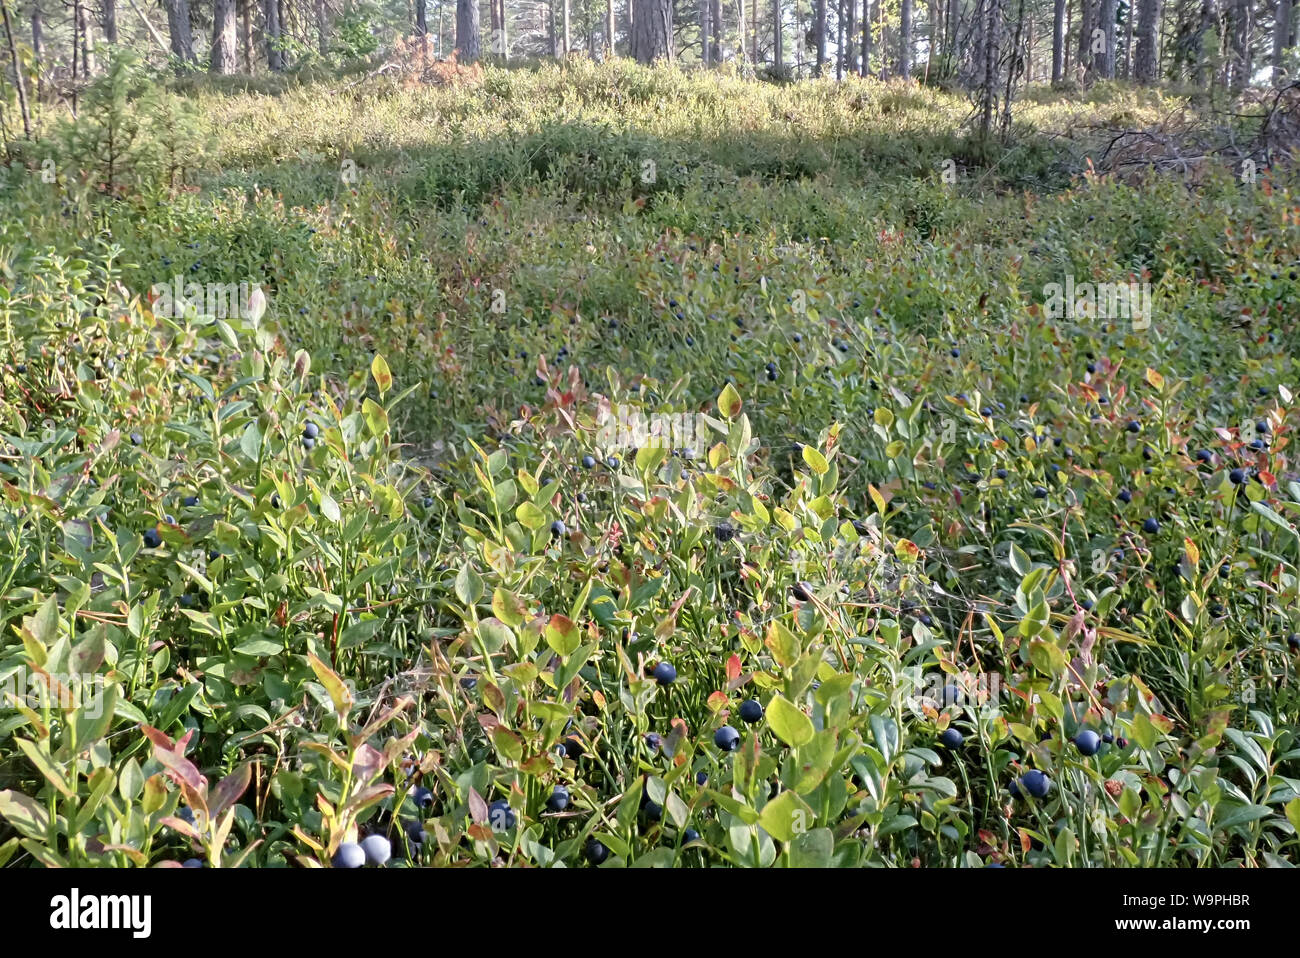 Finnish blueberry berries harvest time,Bothnian Bay, North Ostrobothnia, Hailuoto island, Finland Stock Photo